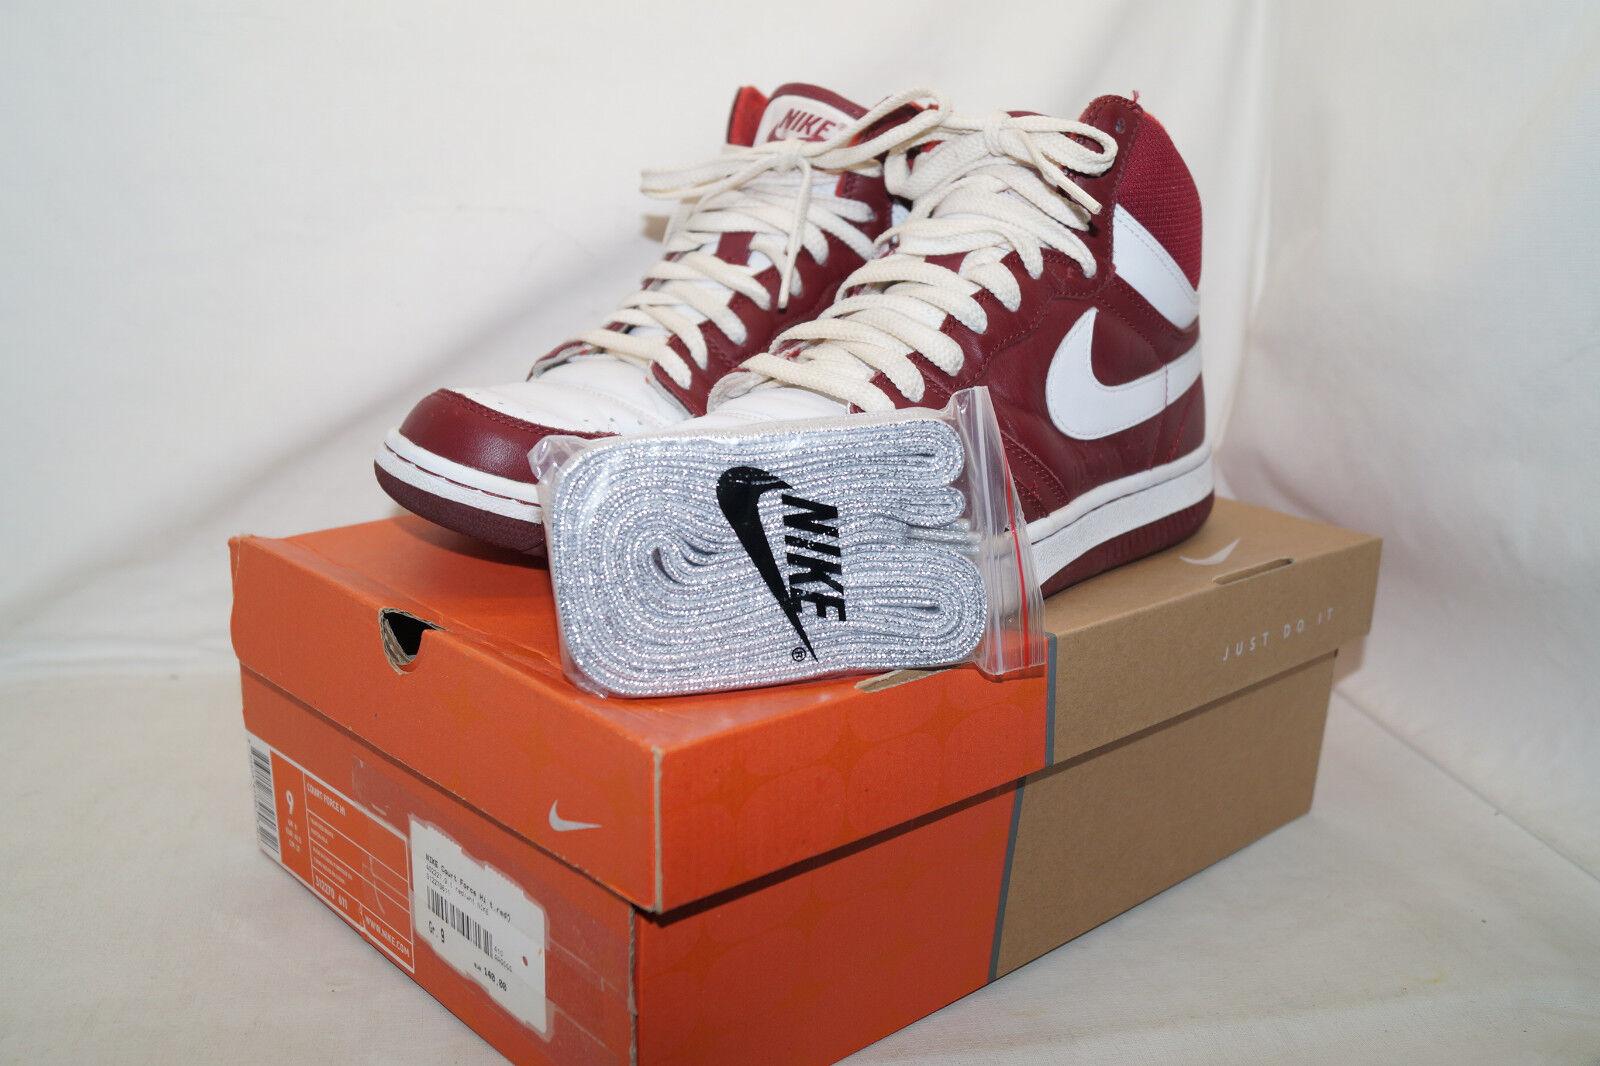 Nike Court Force Hi 2005 talla 42,5 uk.8 rojo Weiss 312270 611